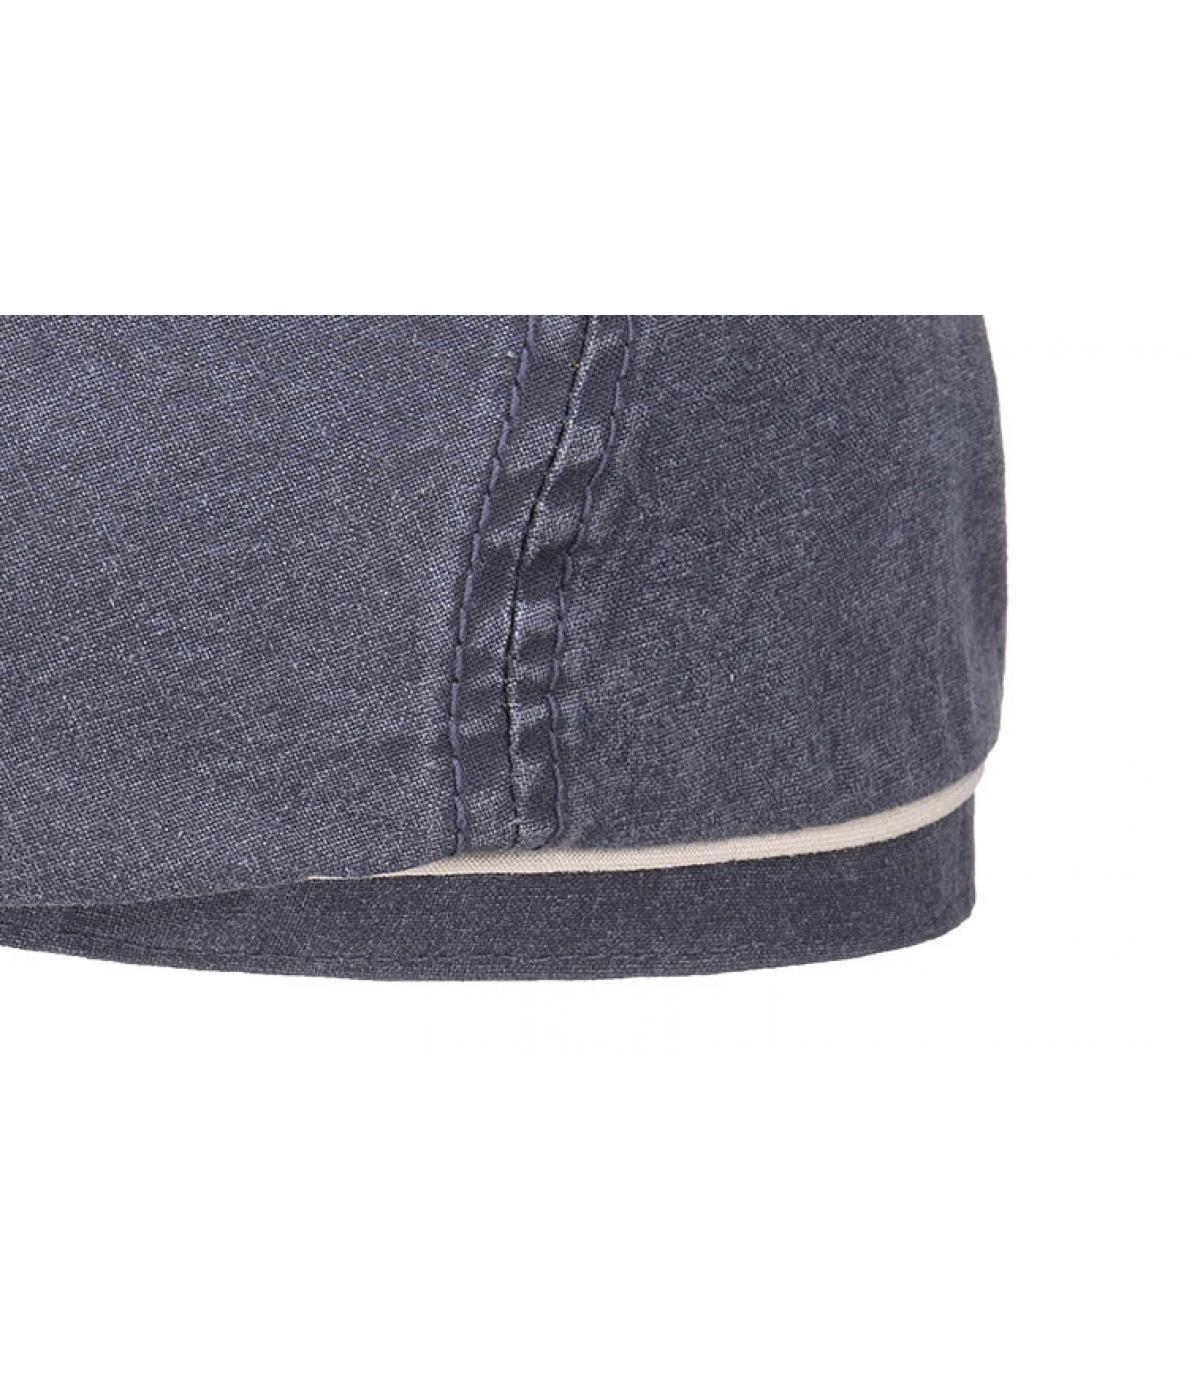 Dettagli Brooklyn cap waxed cotton organic blue - image 3